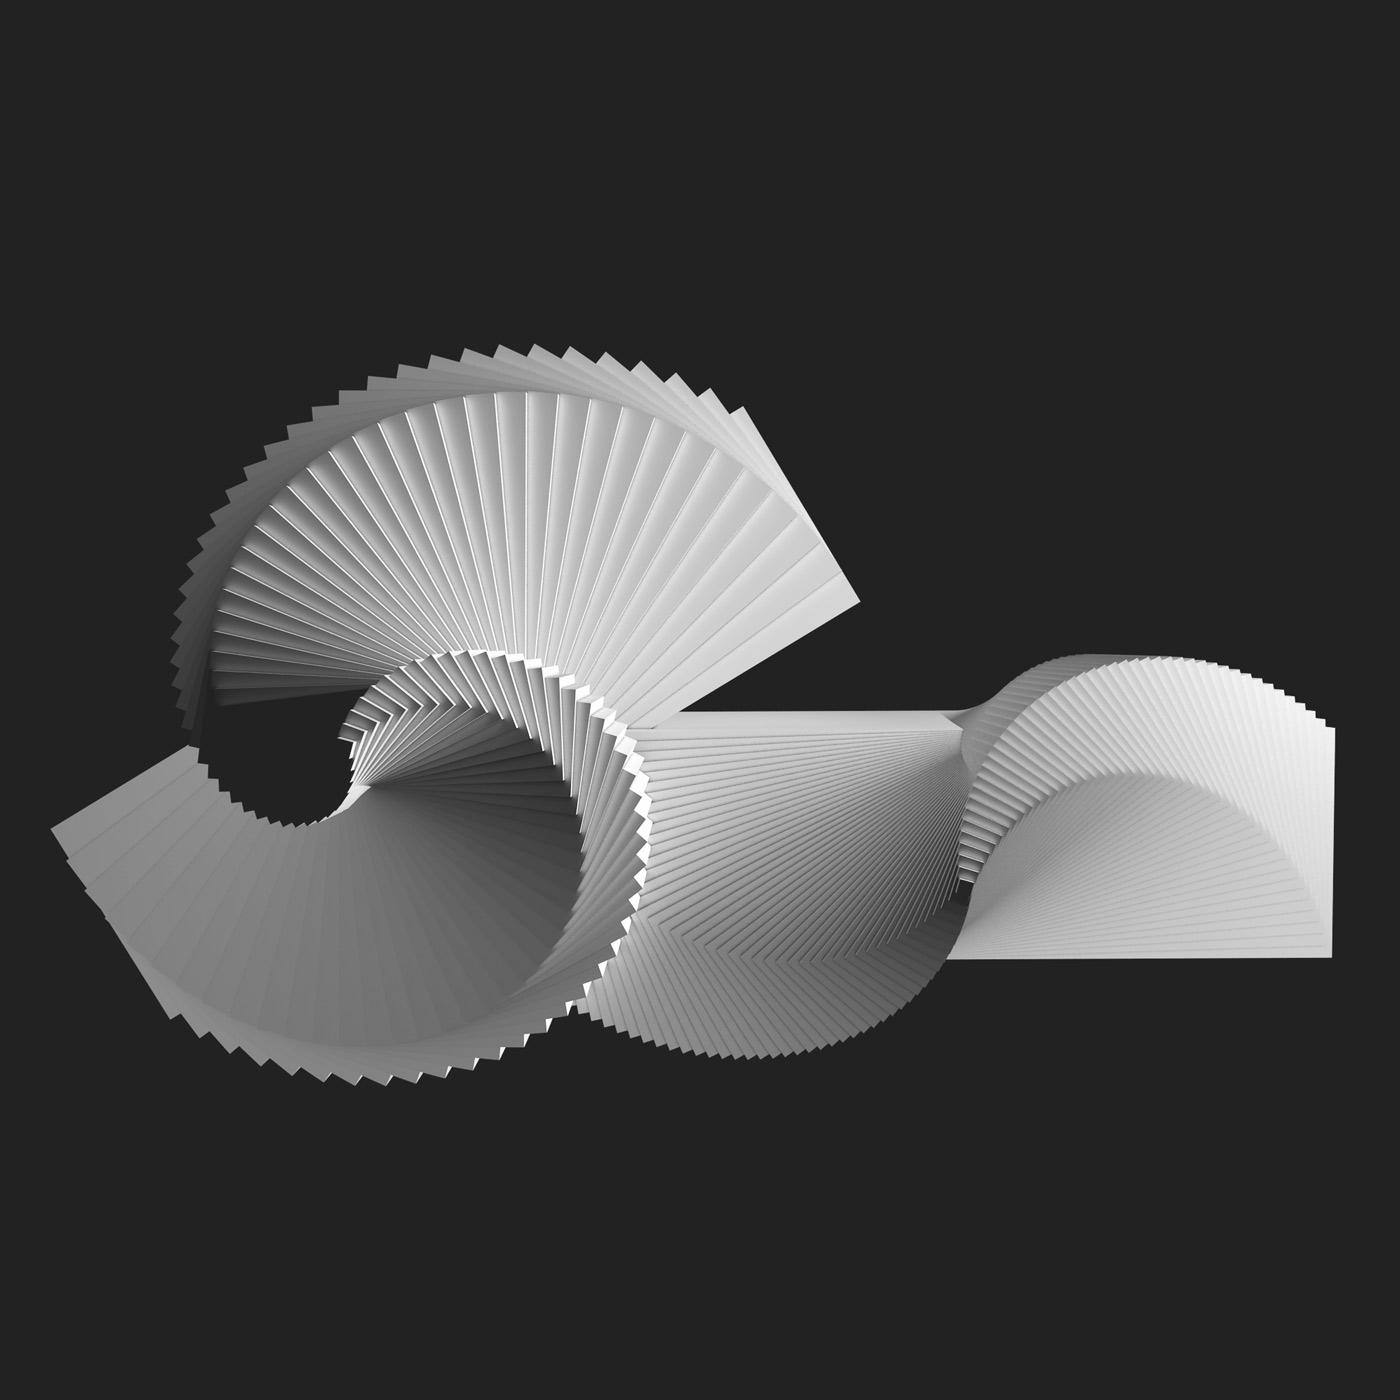 alexa-wright-shell.jpg